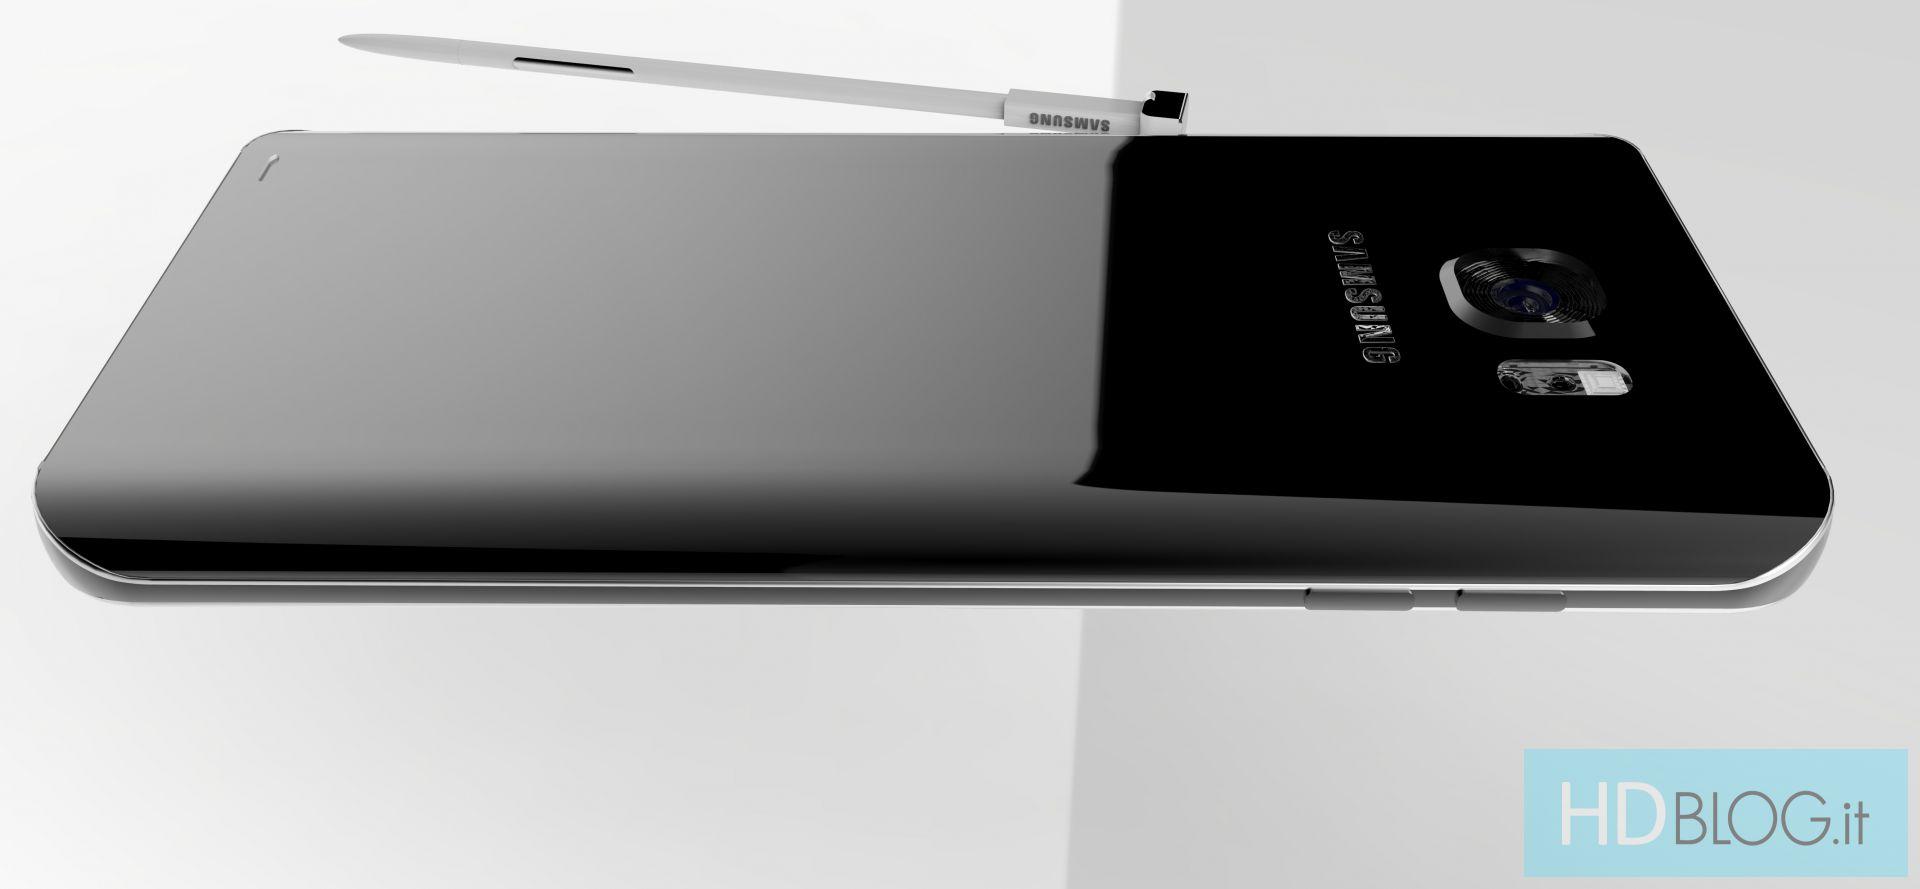 Galaxy-Note-5-schematics-and-concept-renders-20.jpg